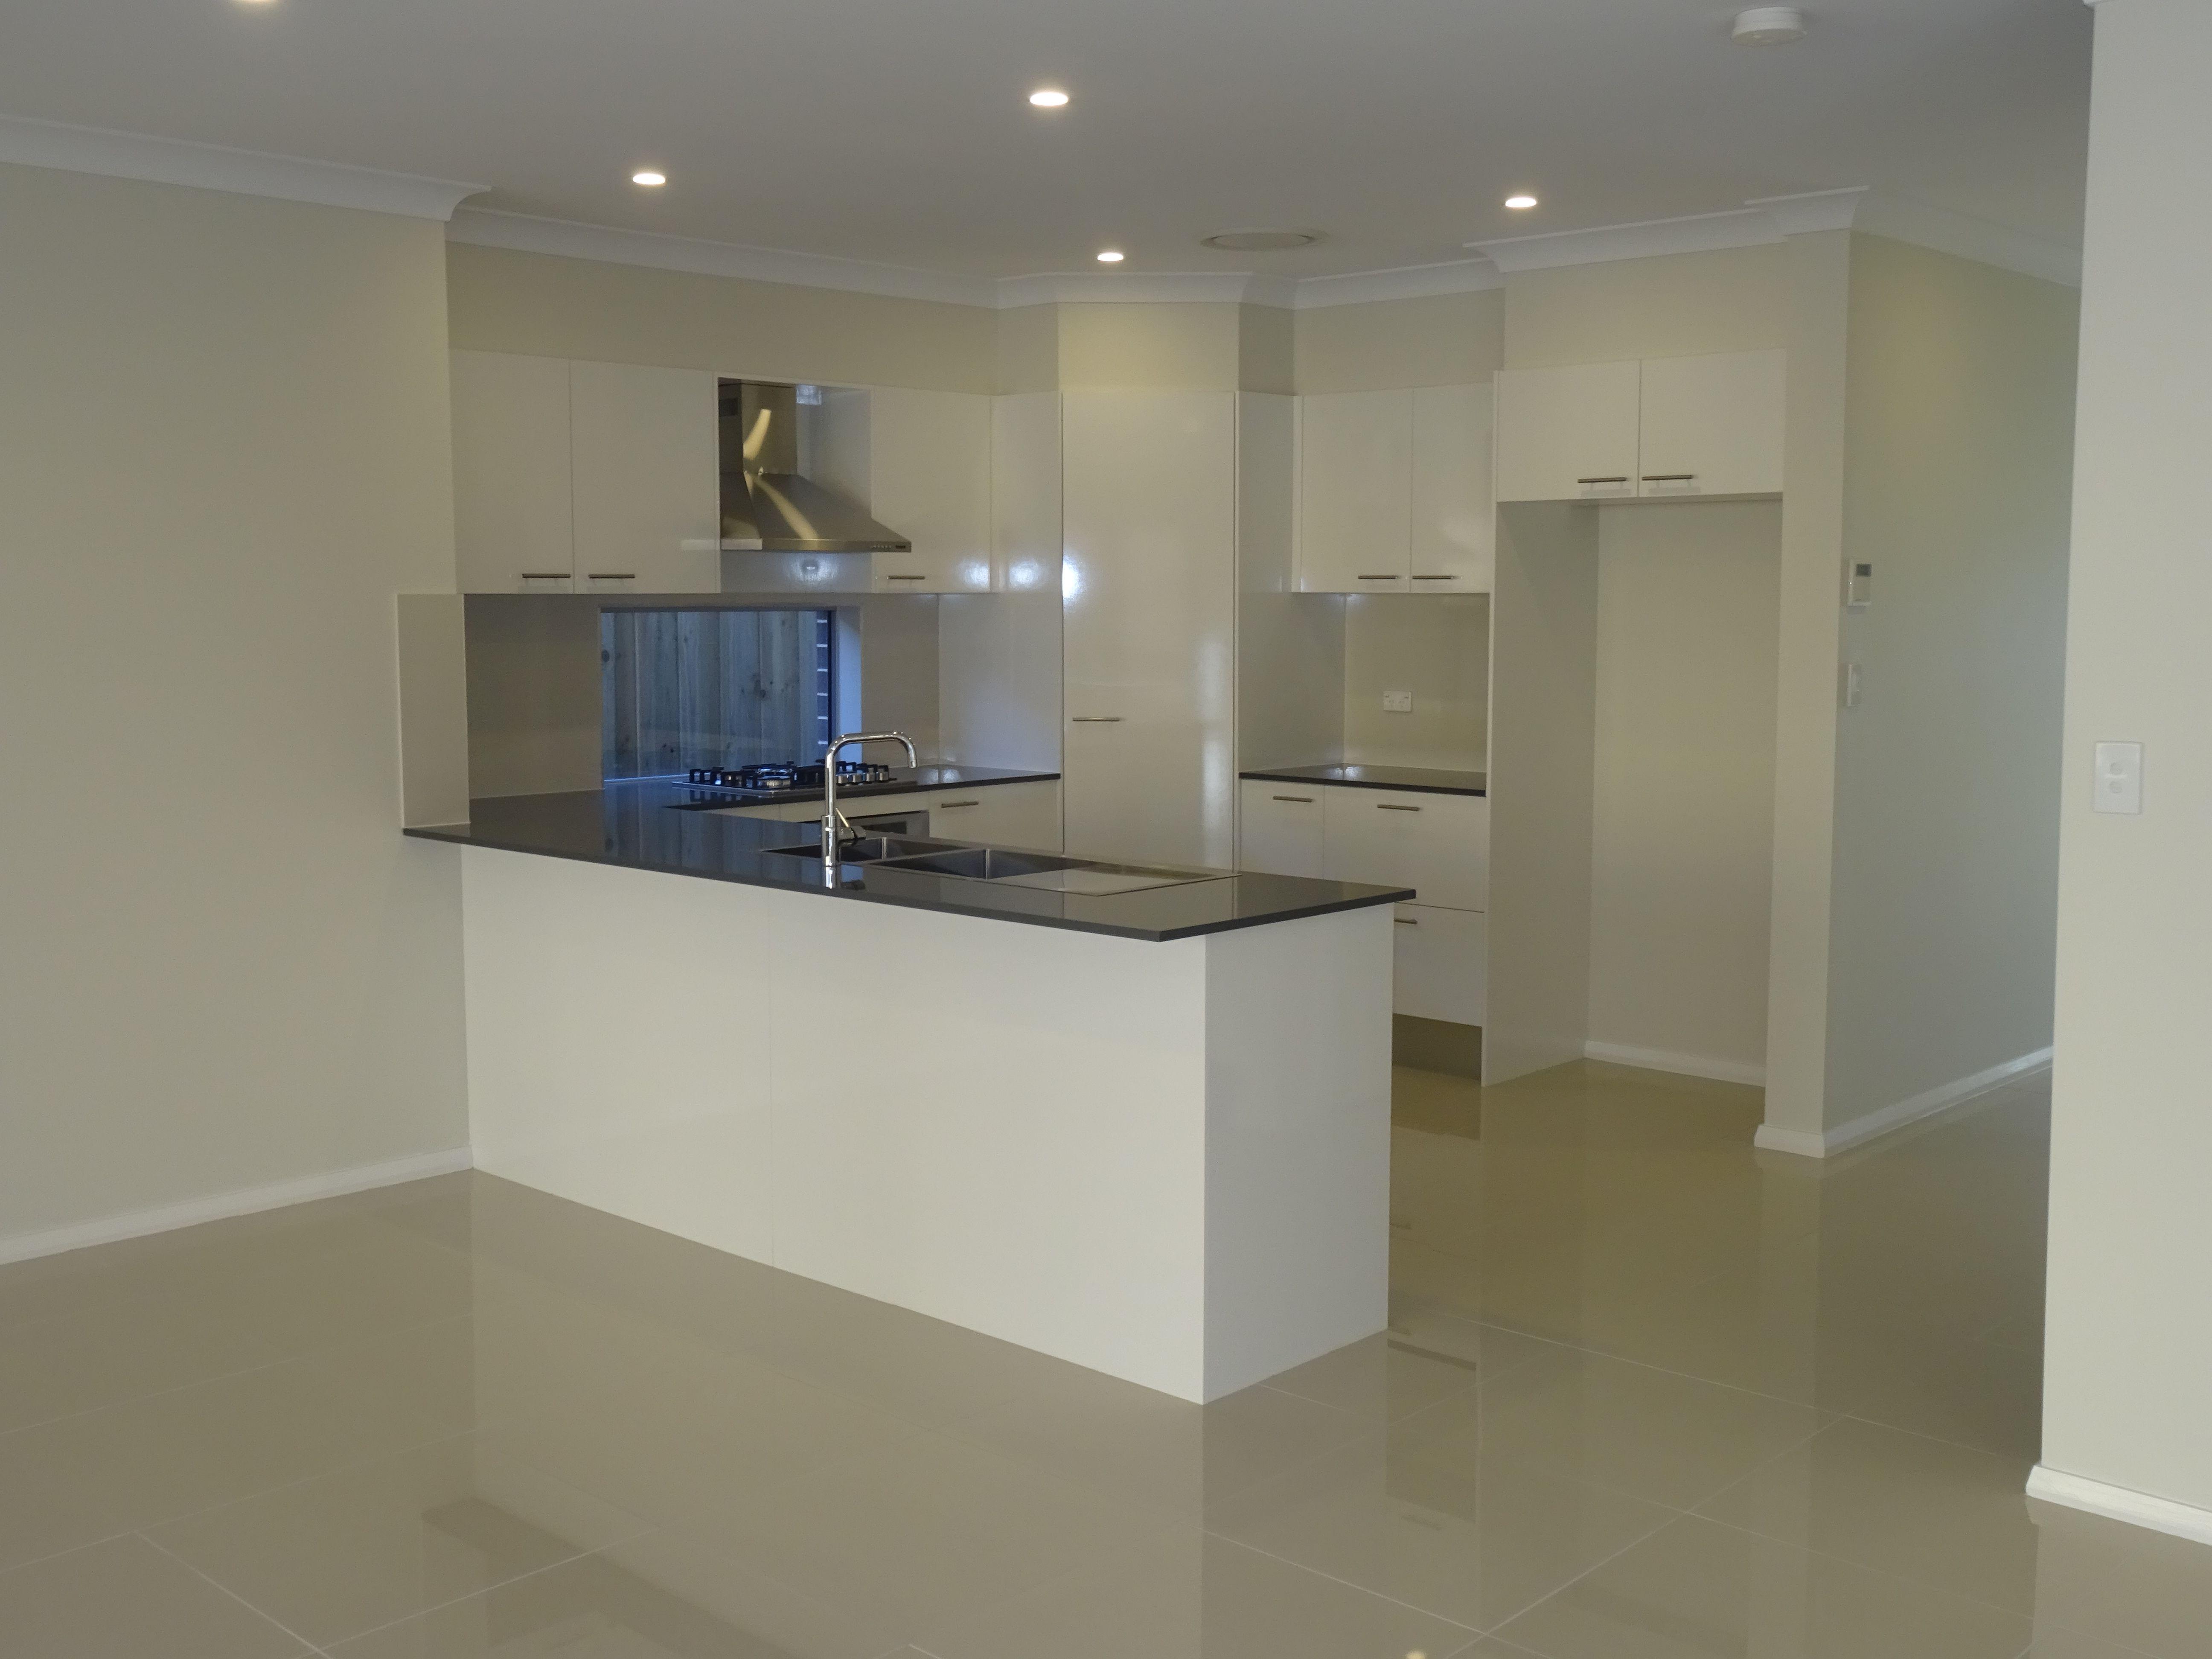 design your kitchen design your kitchen Formica Snowdrift gloss cabnitry Essastone 20mm Benchtop in Carbon mm Baumatic Appliances Design Your KitchenAppliances